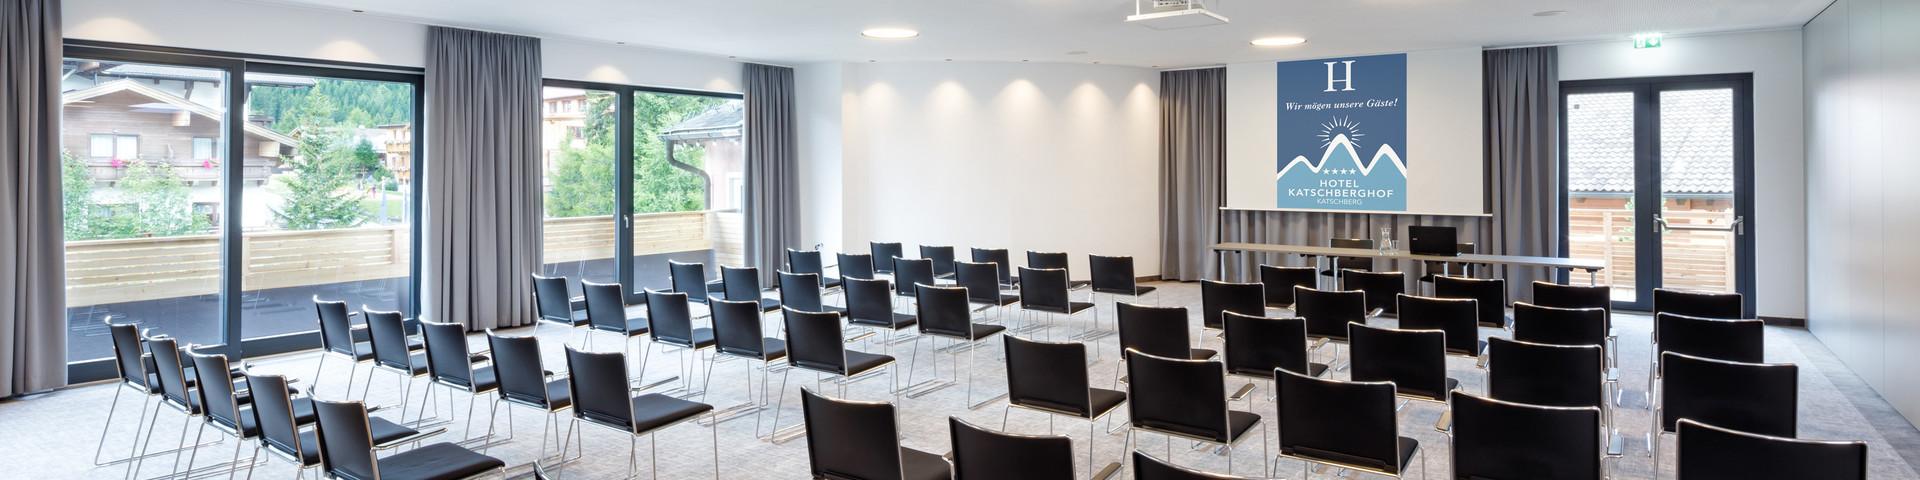 Hotel Katschberghof - Seminarraum © Hinteregger Hotels - Christian Wöckinger - TVB Katschberg